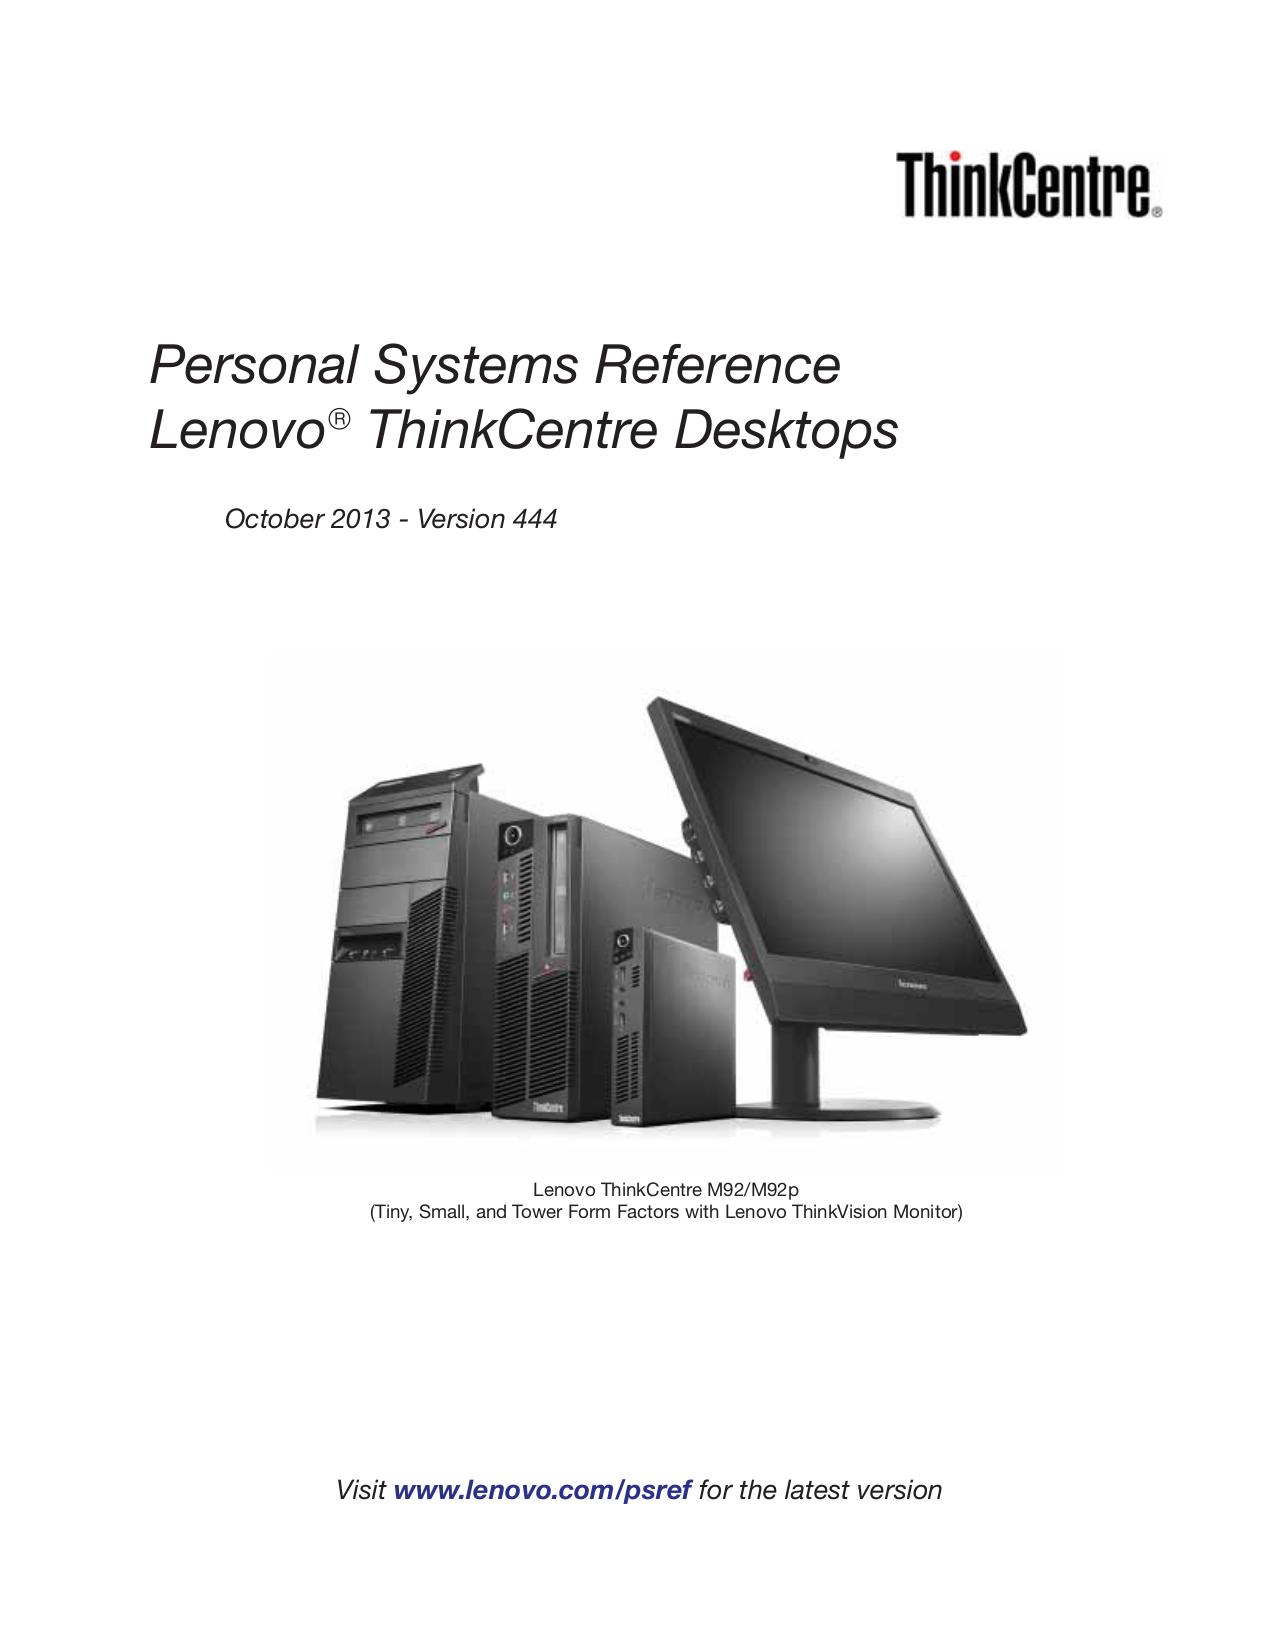 pdf for Lenovo Desktop ThinkCentre M58e 7303 manual